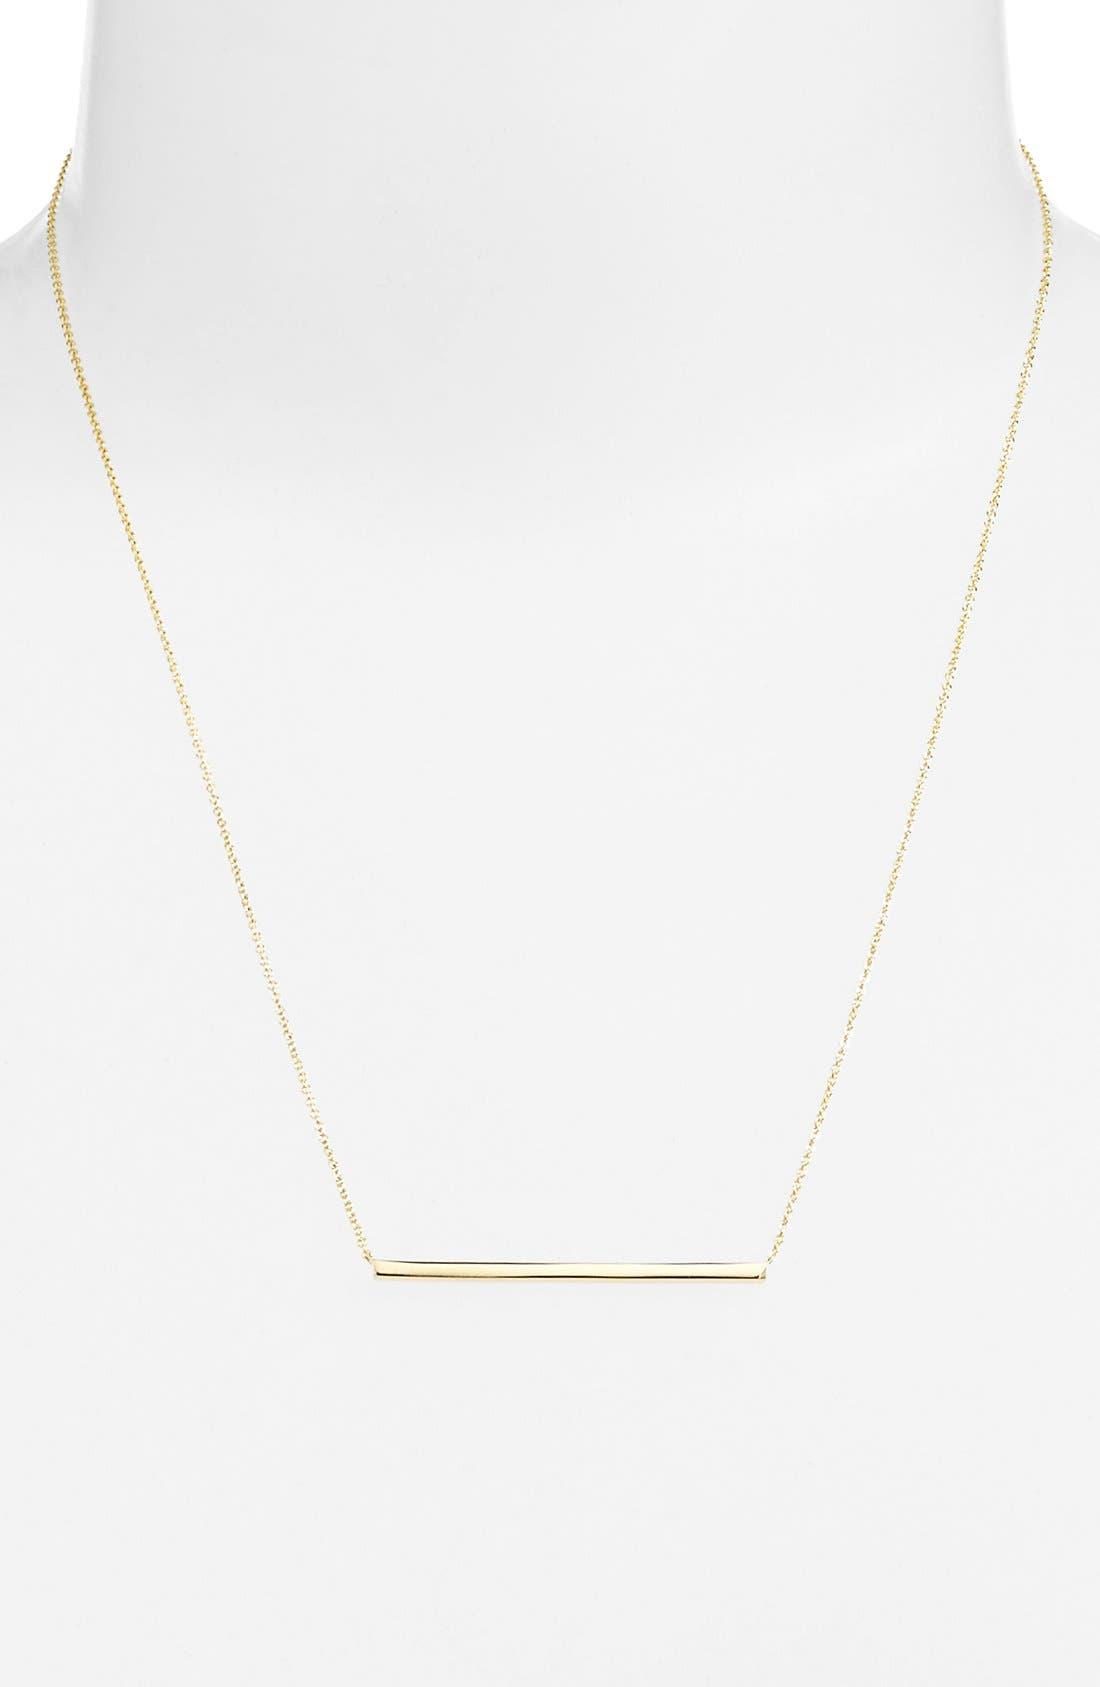 14k Gold Bar Pendant Necklace,                             Alternate thumbnail 4, color,